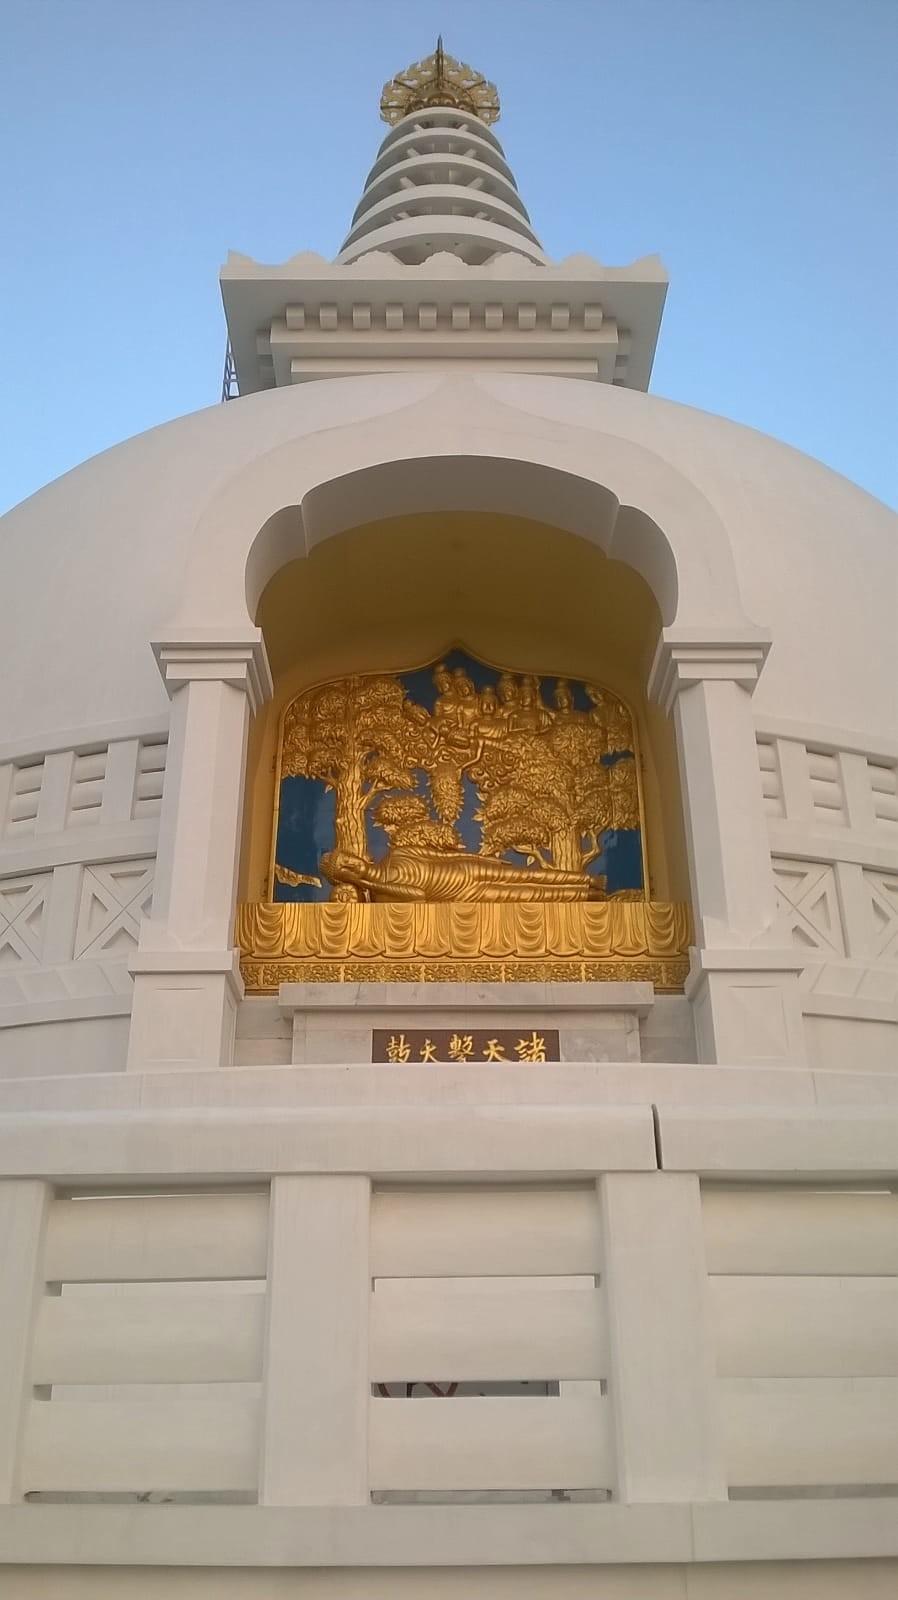 viaggio-in-nepal-5c590b5b1b9b097afa61250